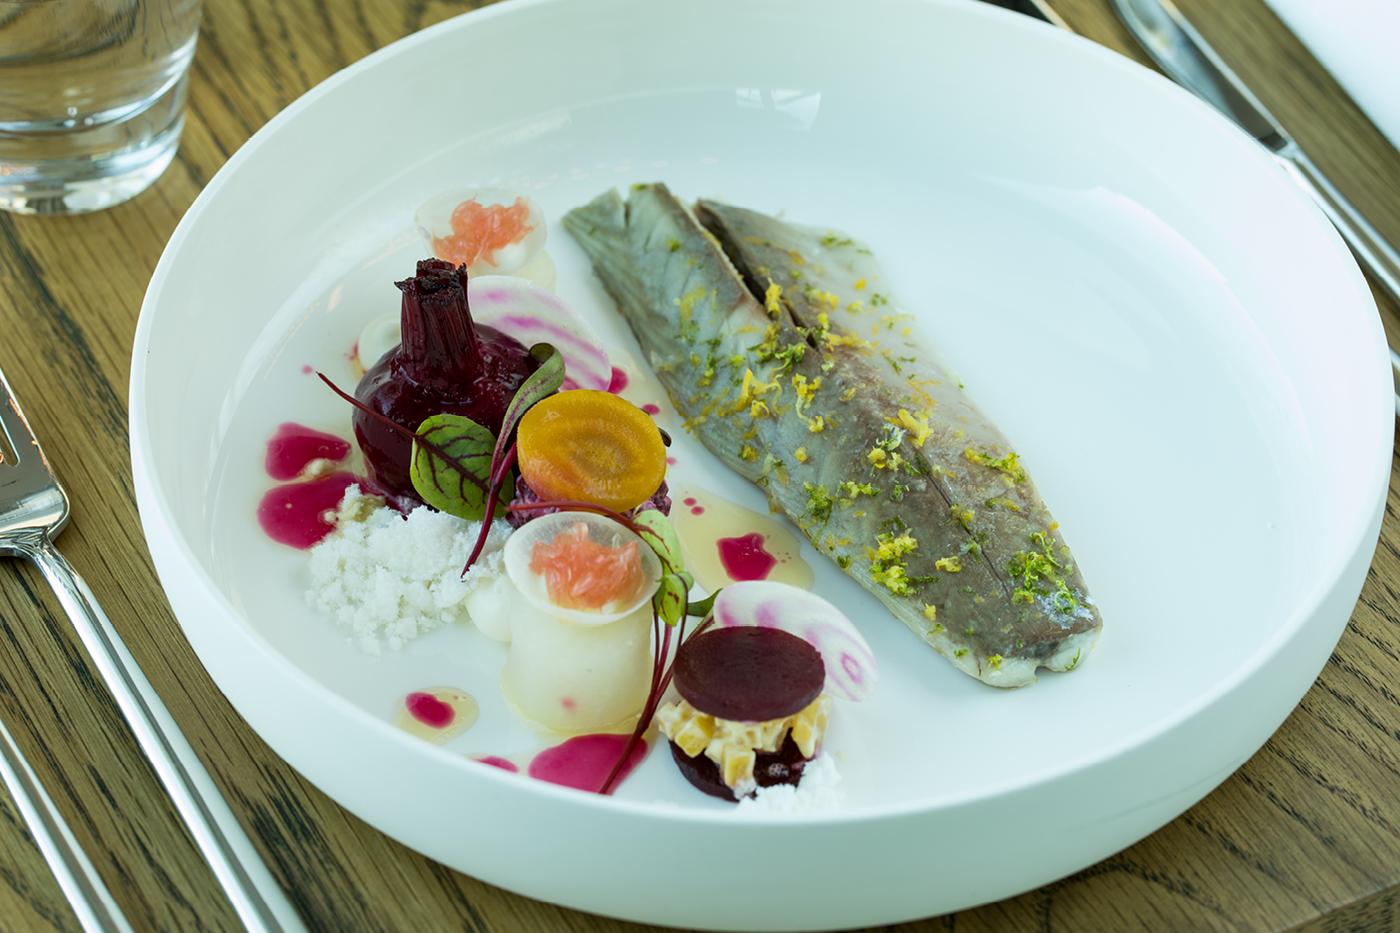 Slow cooked mackerel